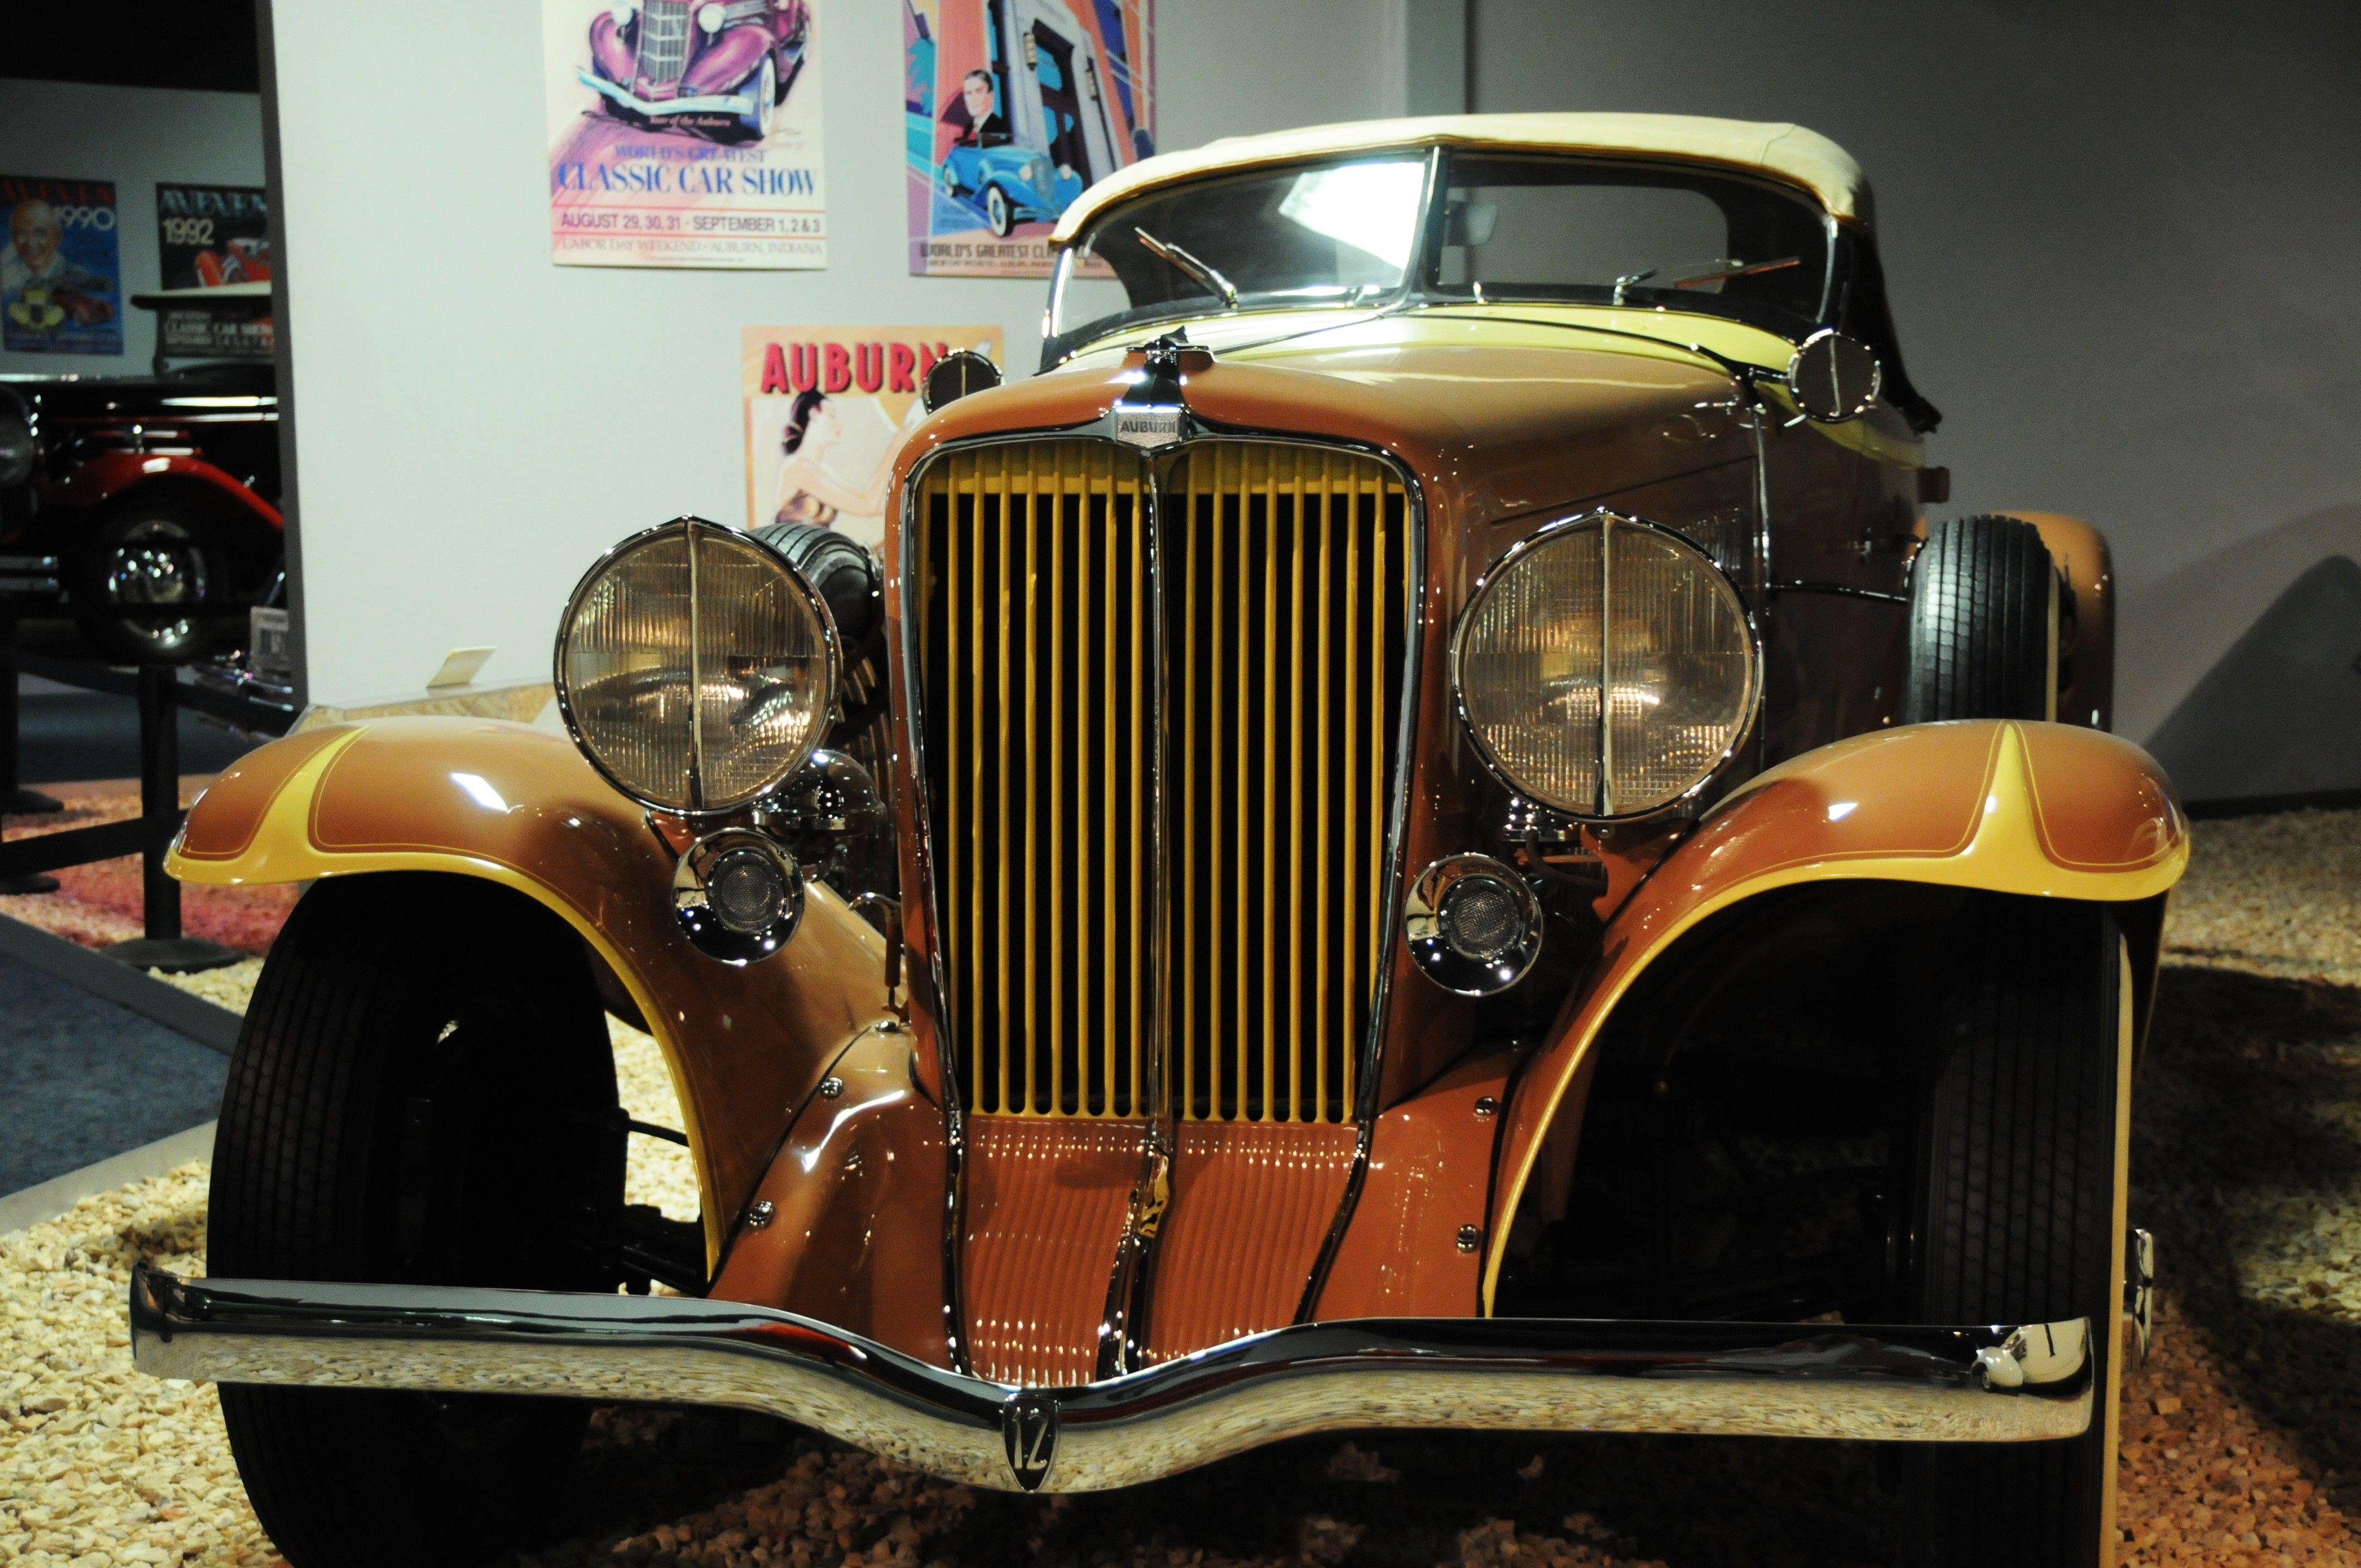 1933 Auburn At The National Automobile Museum Reno Nevada Antique Cars Auburn Car Good Looking Cars